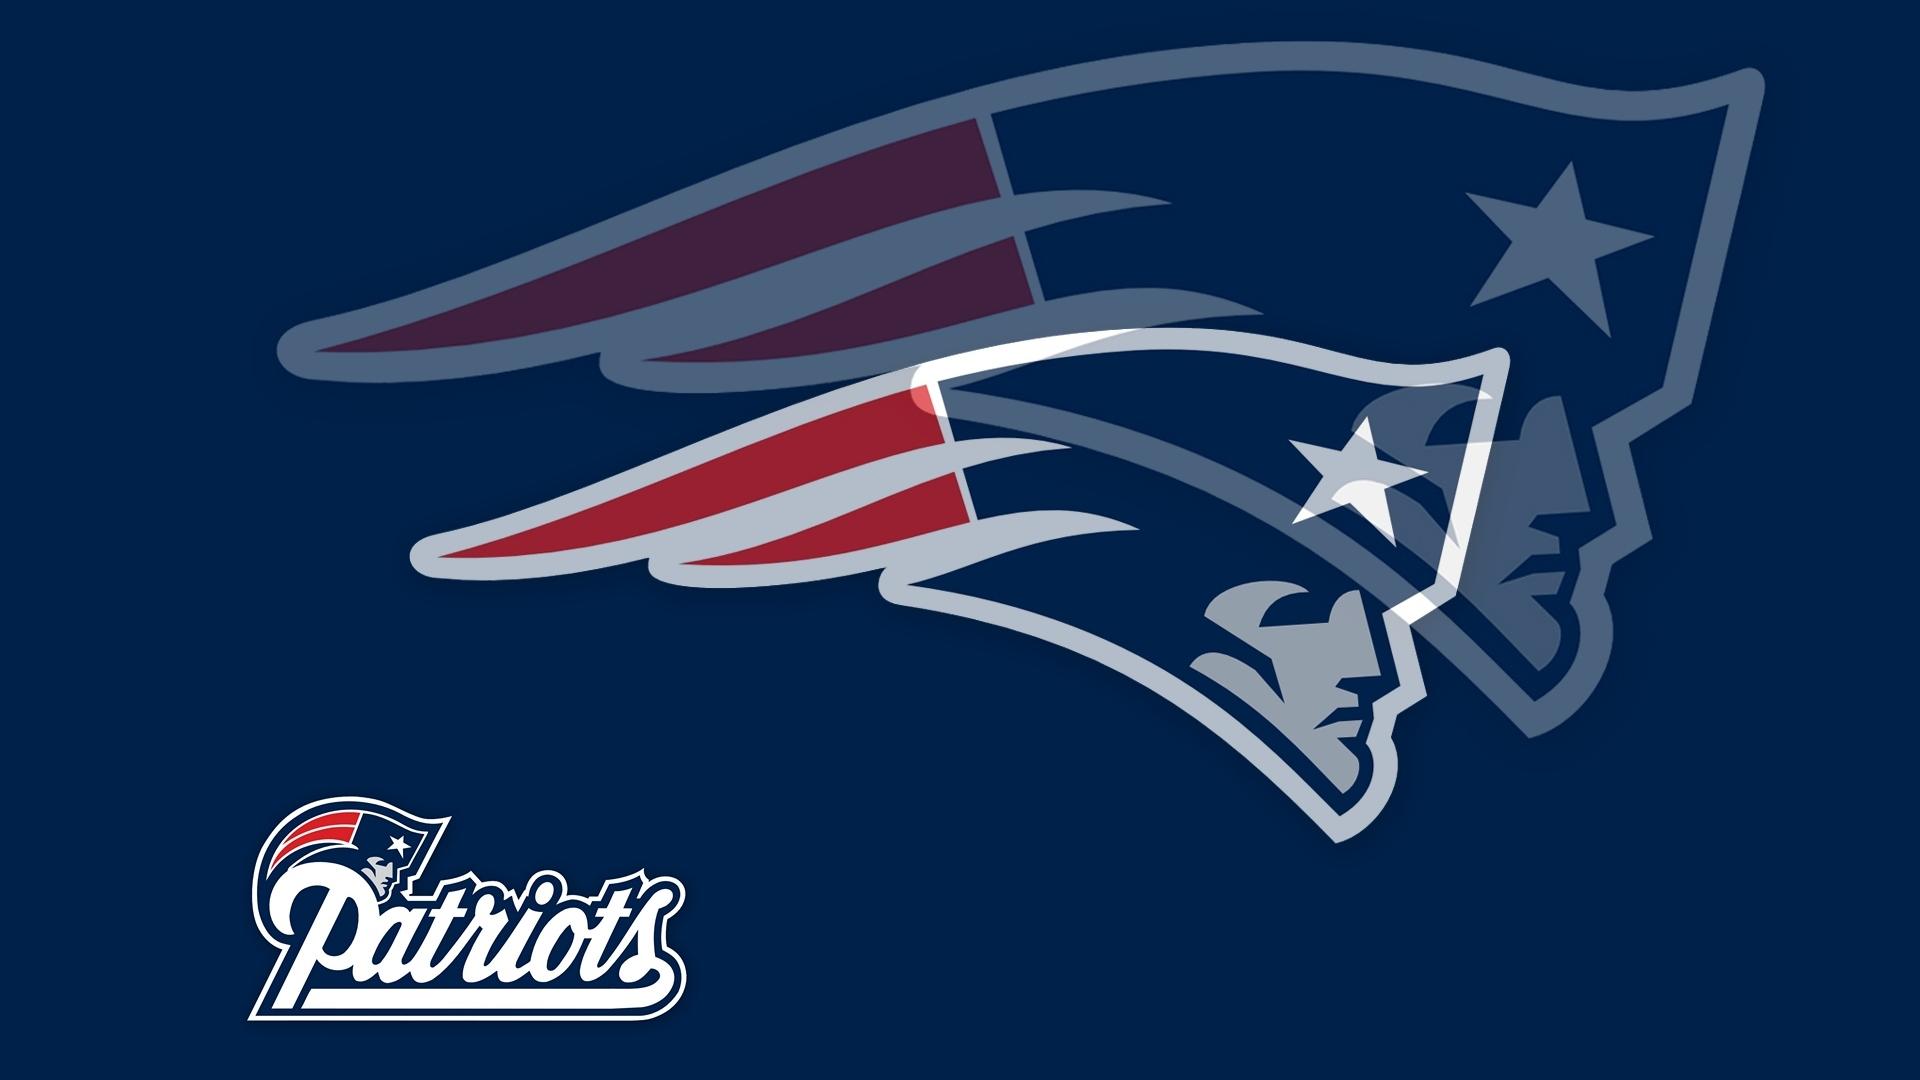 Patriots Logo Echo Style 1920x1080 HD NFL New England Patriots 1920x1080